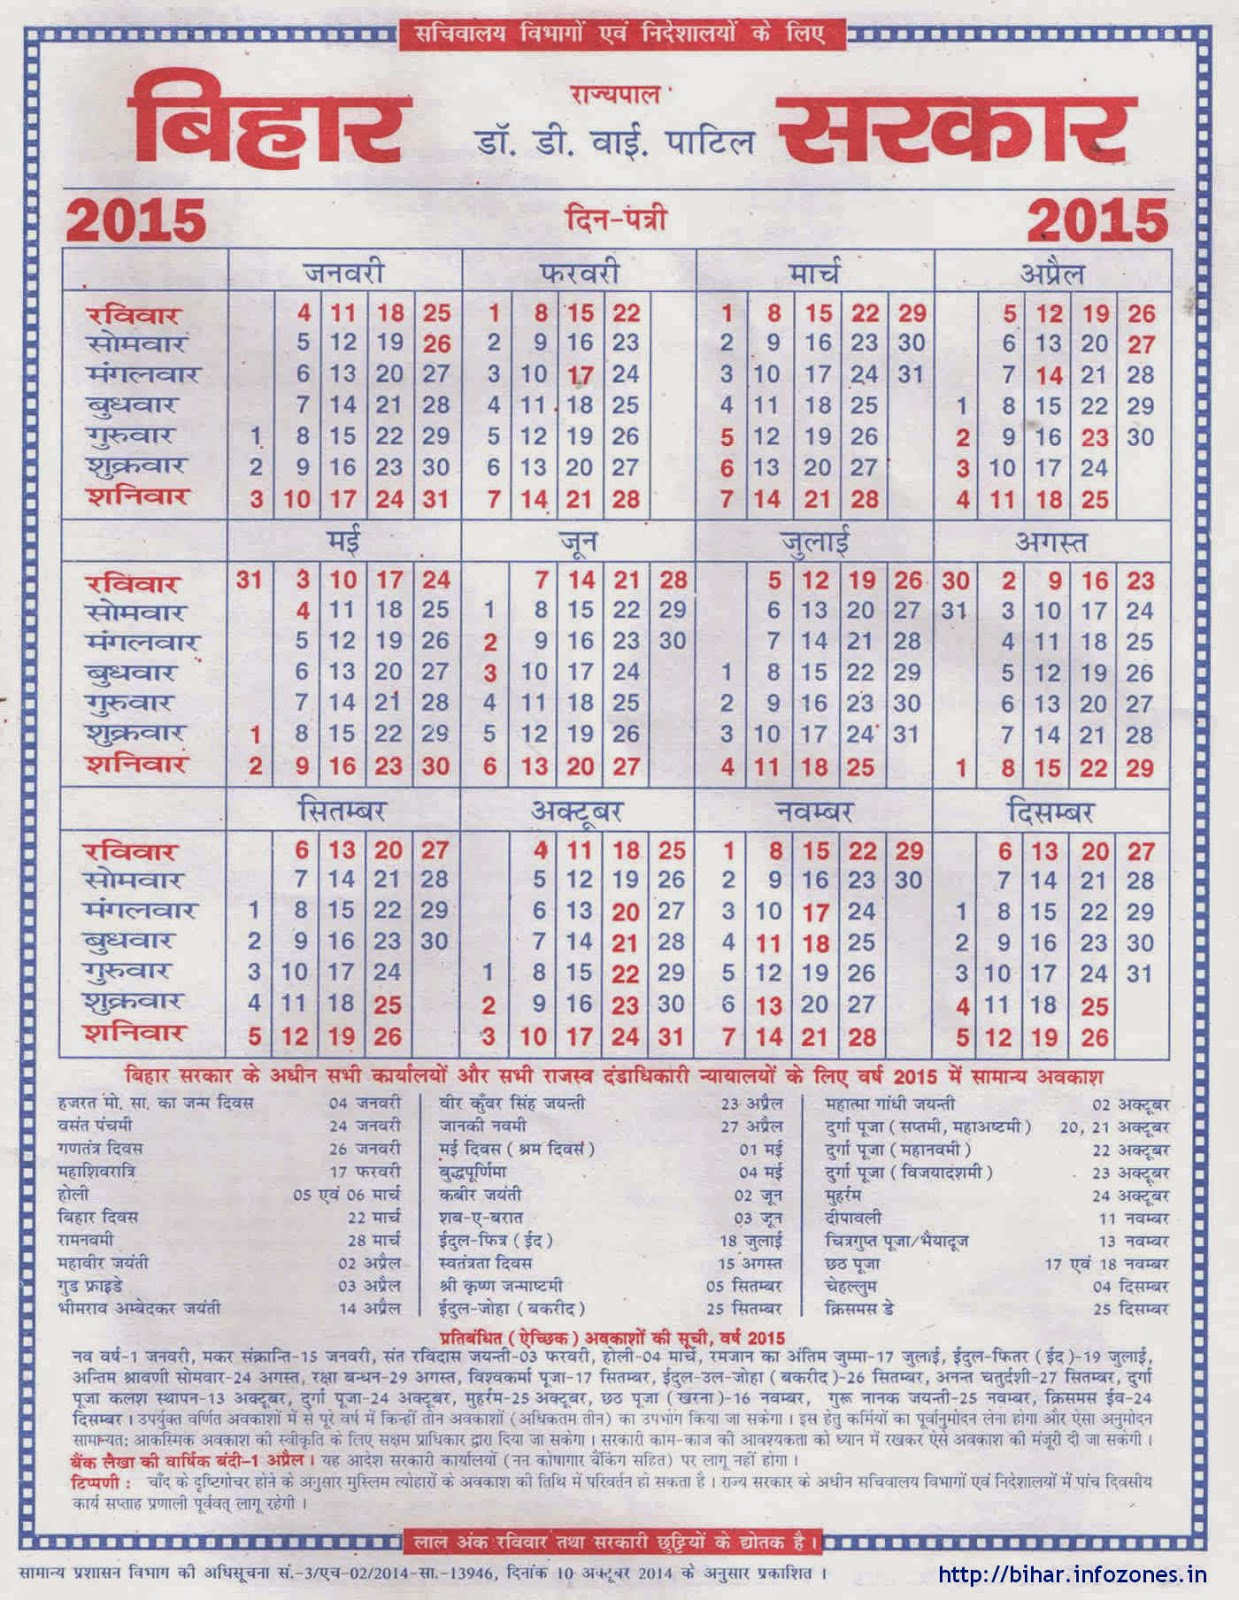 Bihar Government Calendar 2015 within Bihar Govt Calander